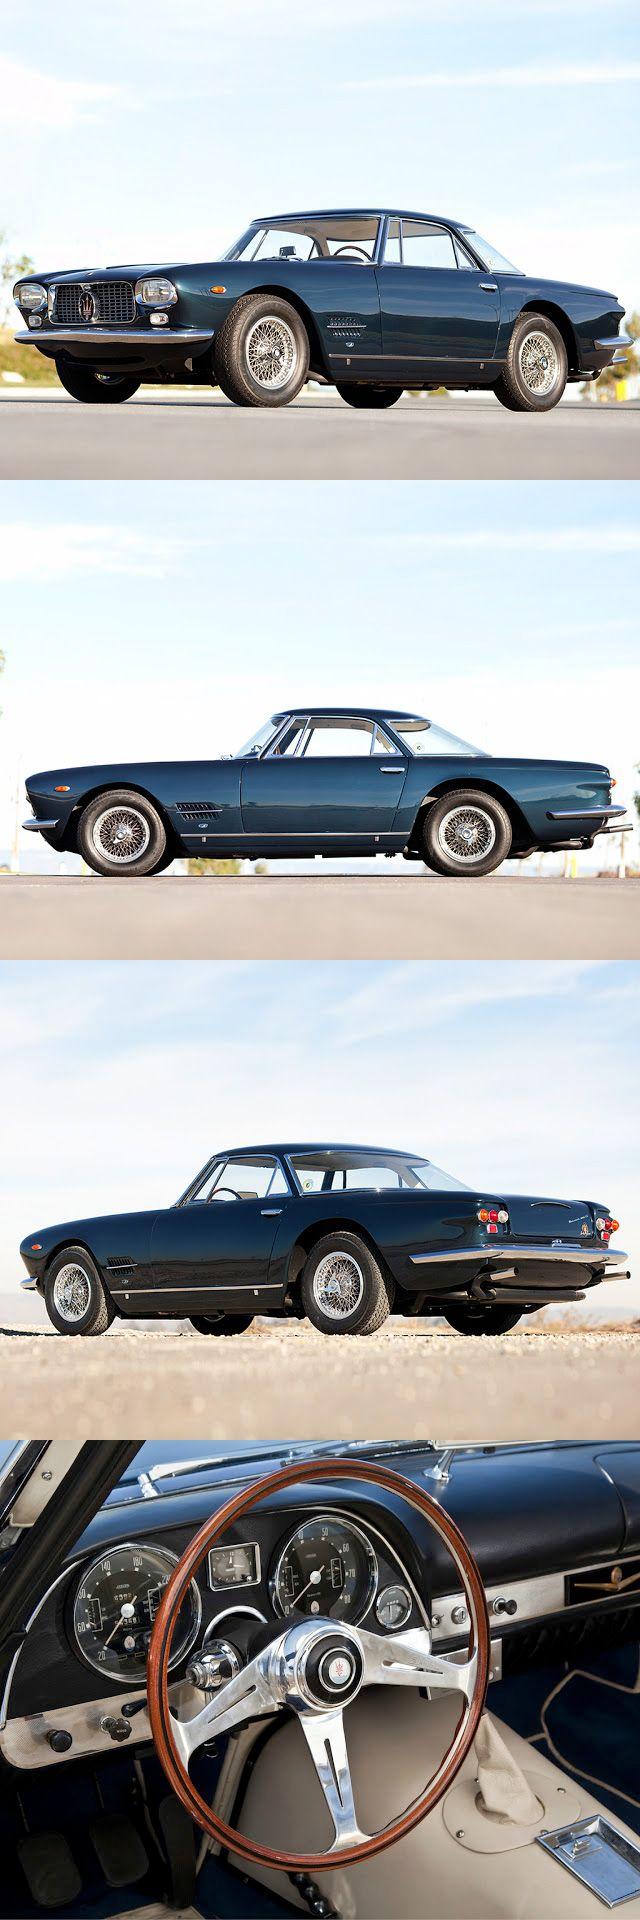 Visit The MACHINE Shop Café... (Best of Maserati @ MACHINE) Rare Maserati 5000 GT Coupé